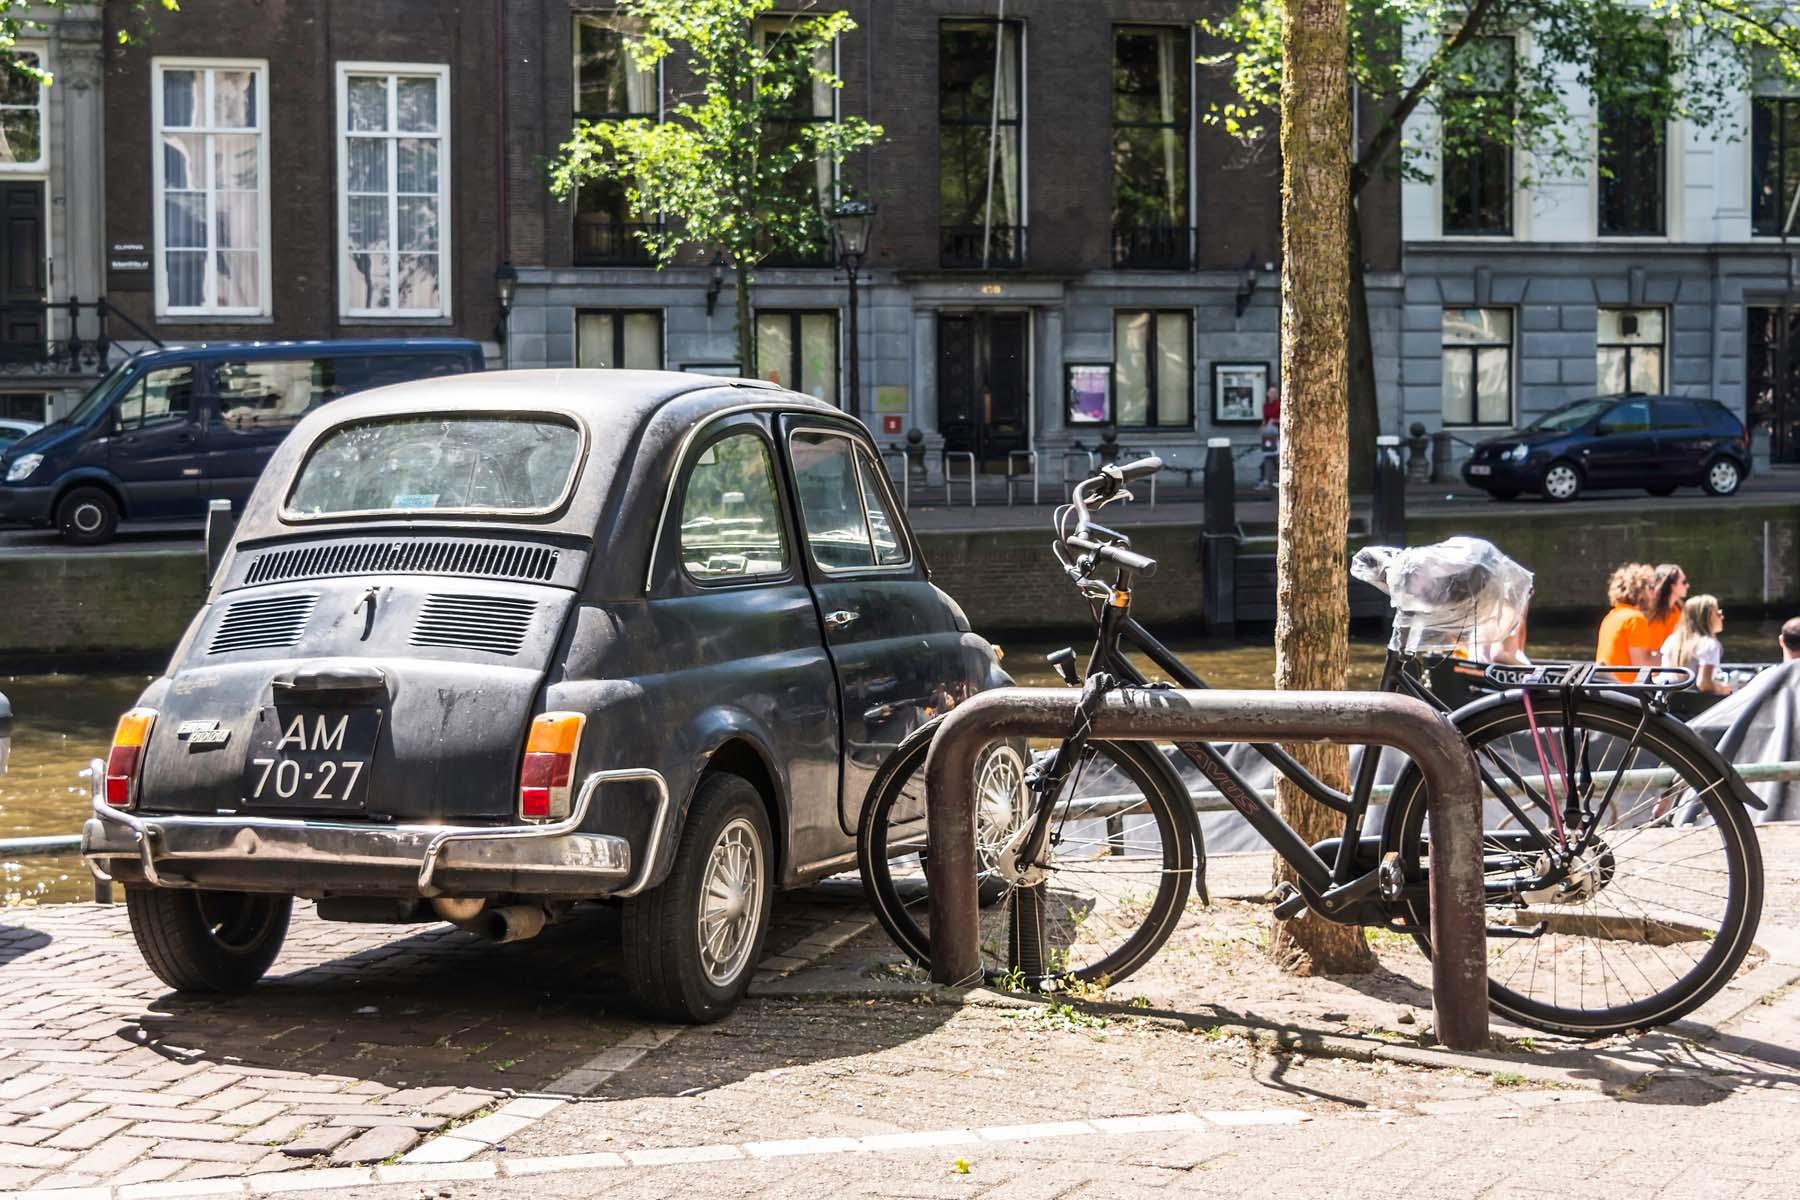 Car in Amsterdam